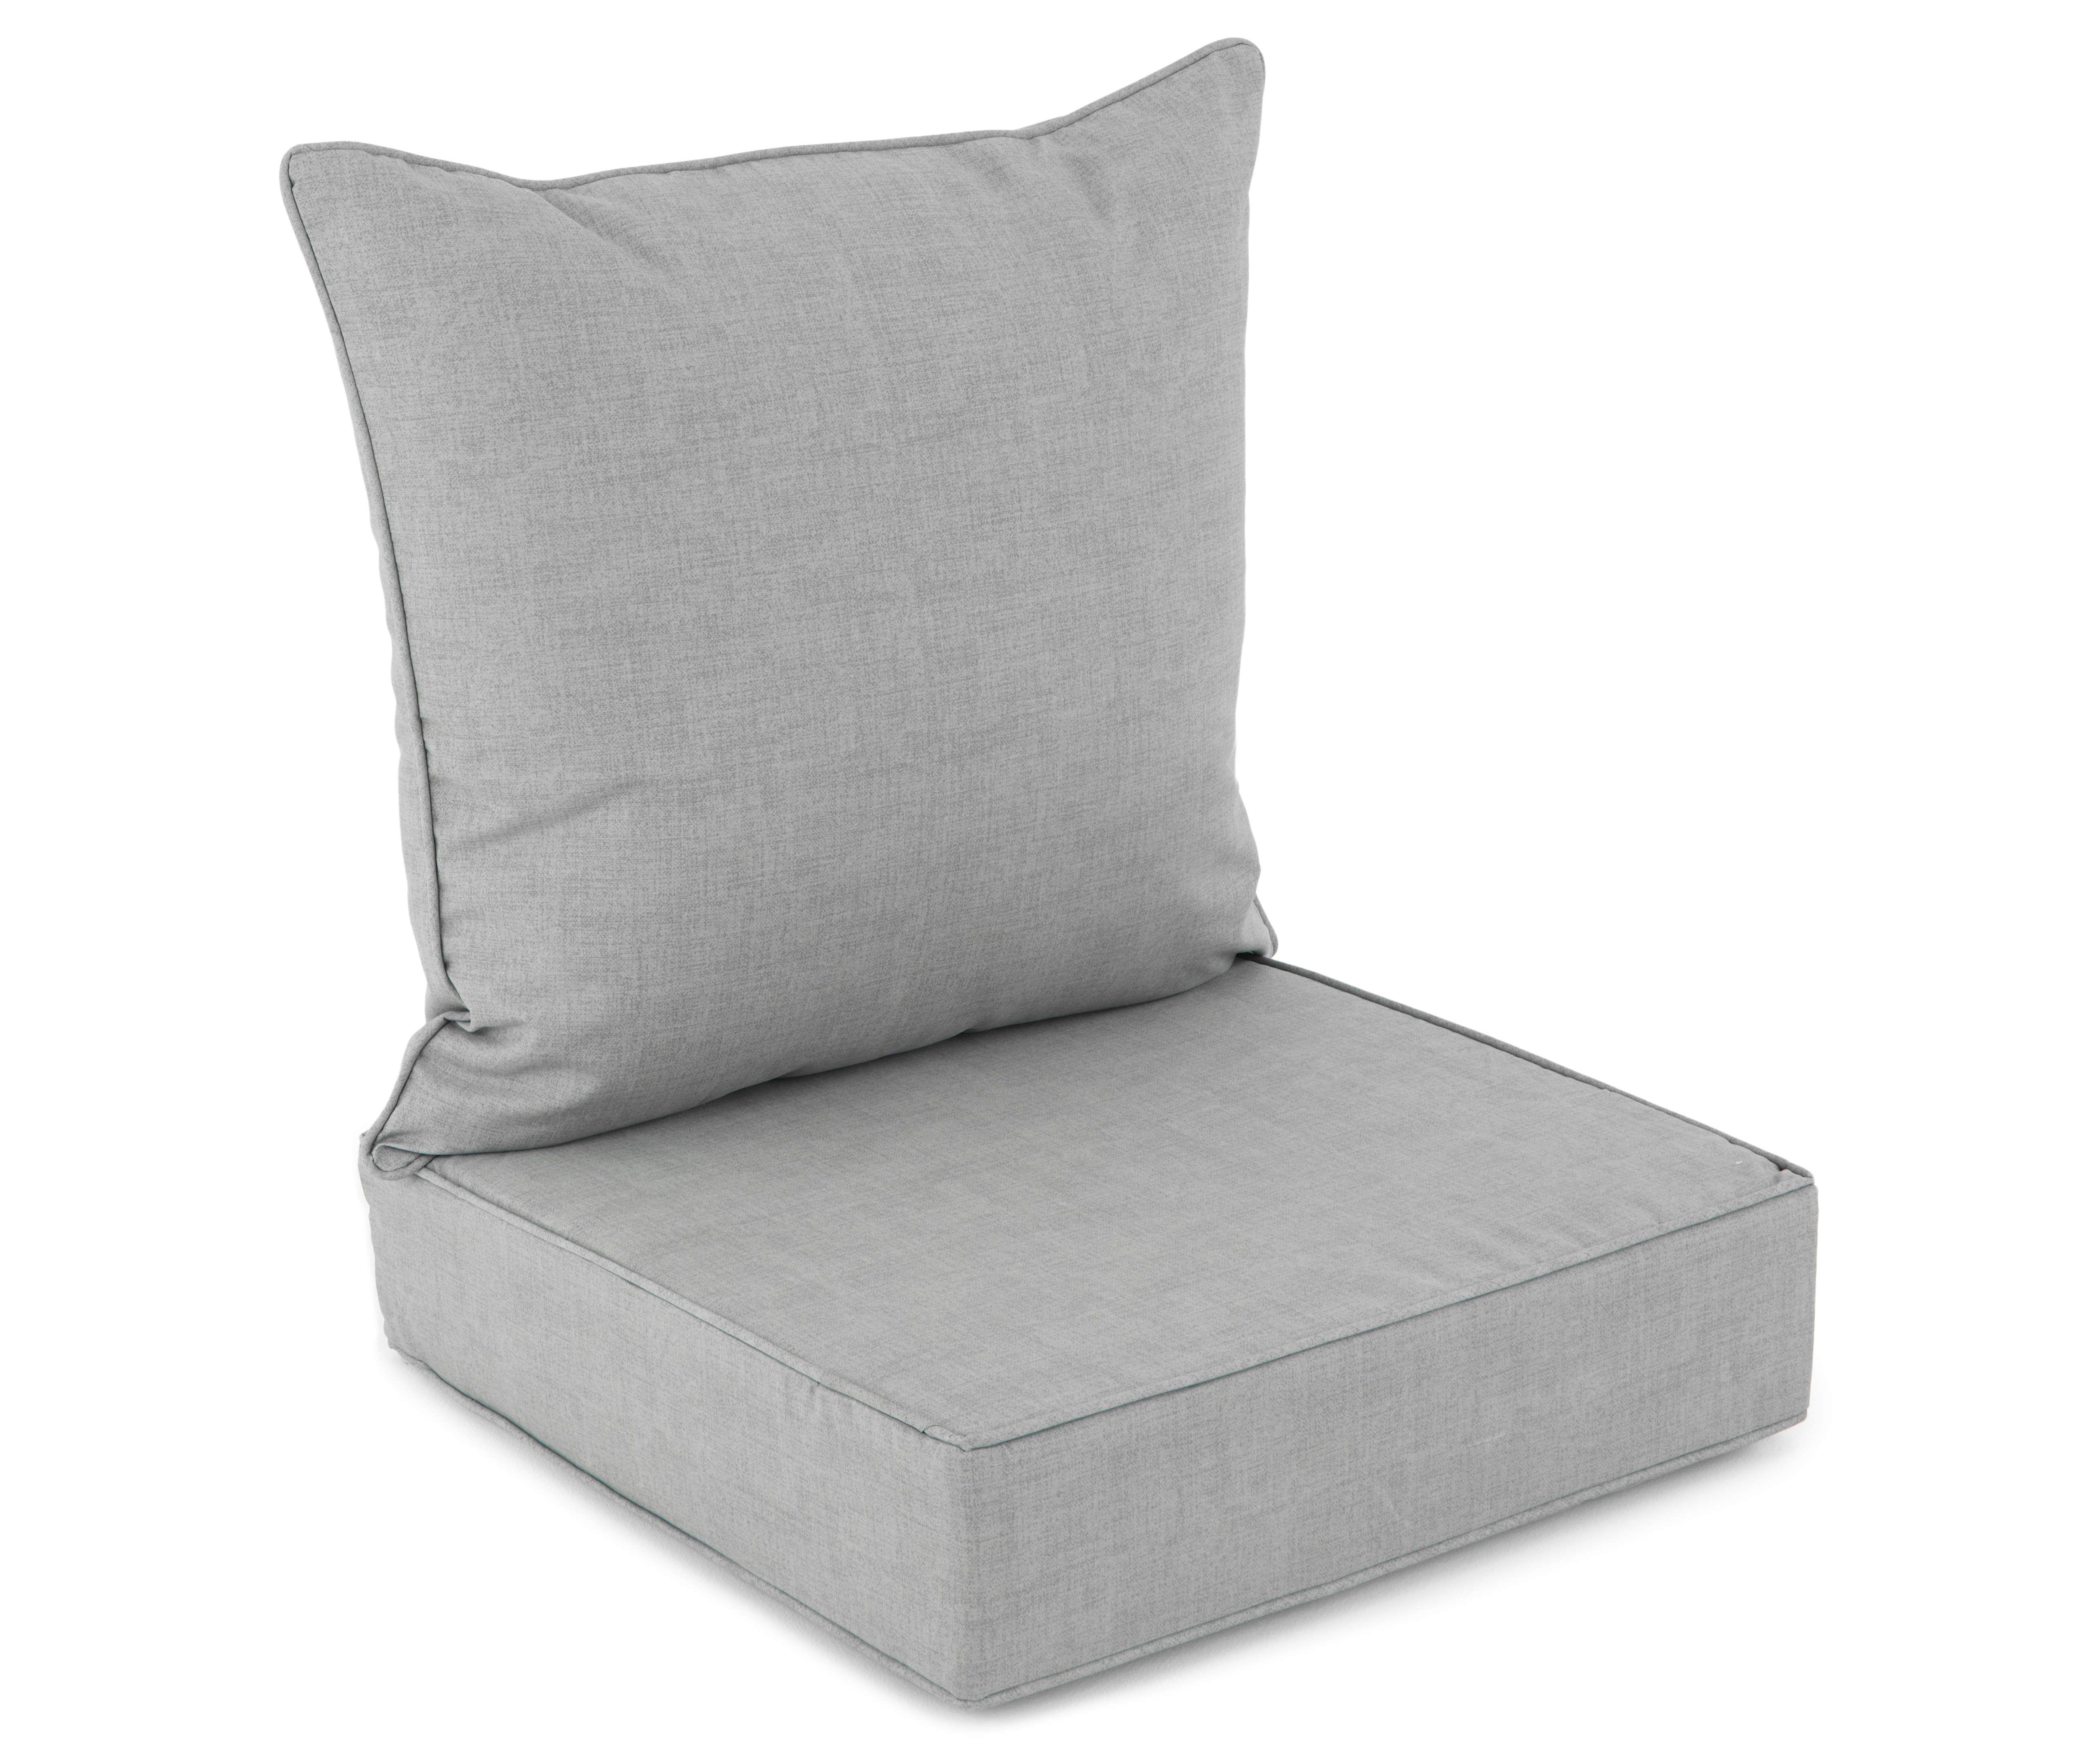 Deep Seat Back Cushion Sets Big Lots In 2020 Patio Cushions Deep Seating Diy Patio Cushions